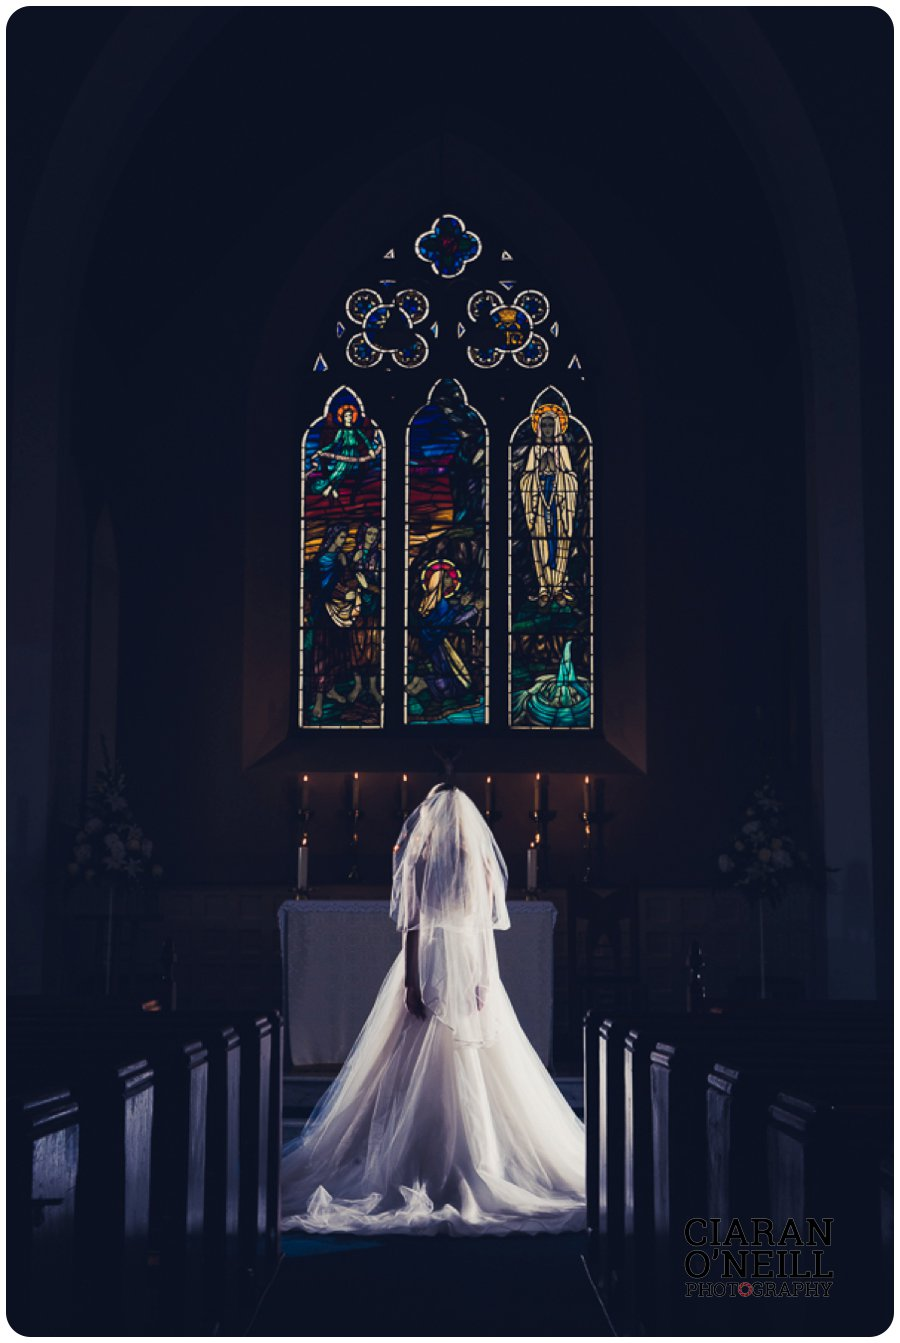 Linda & Jae's wedding at the Merchant Hotel by Ciaran O'Neill Photography 11